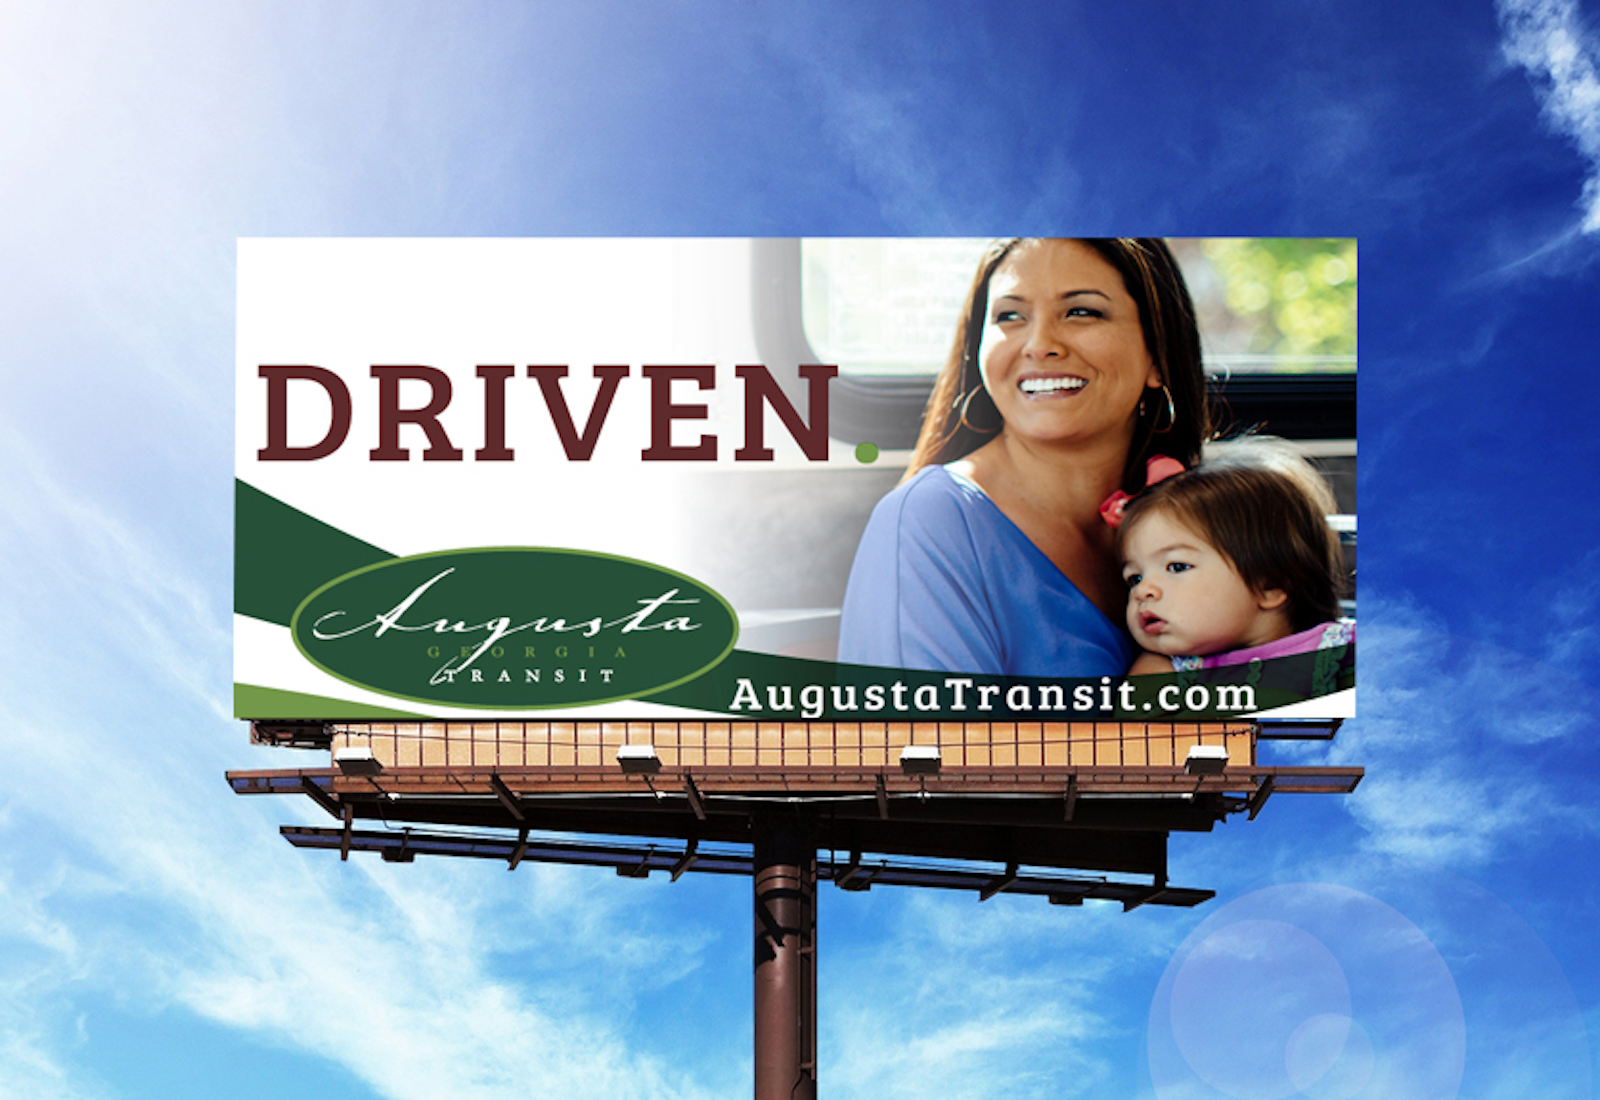 marketing strategy - billboards